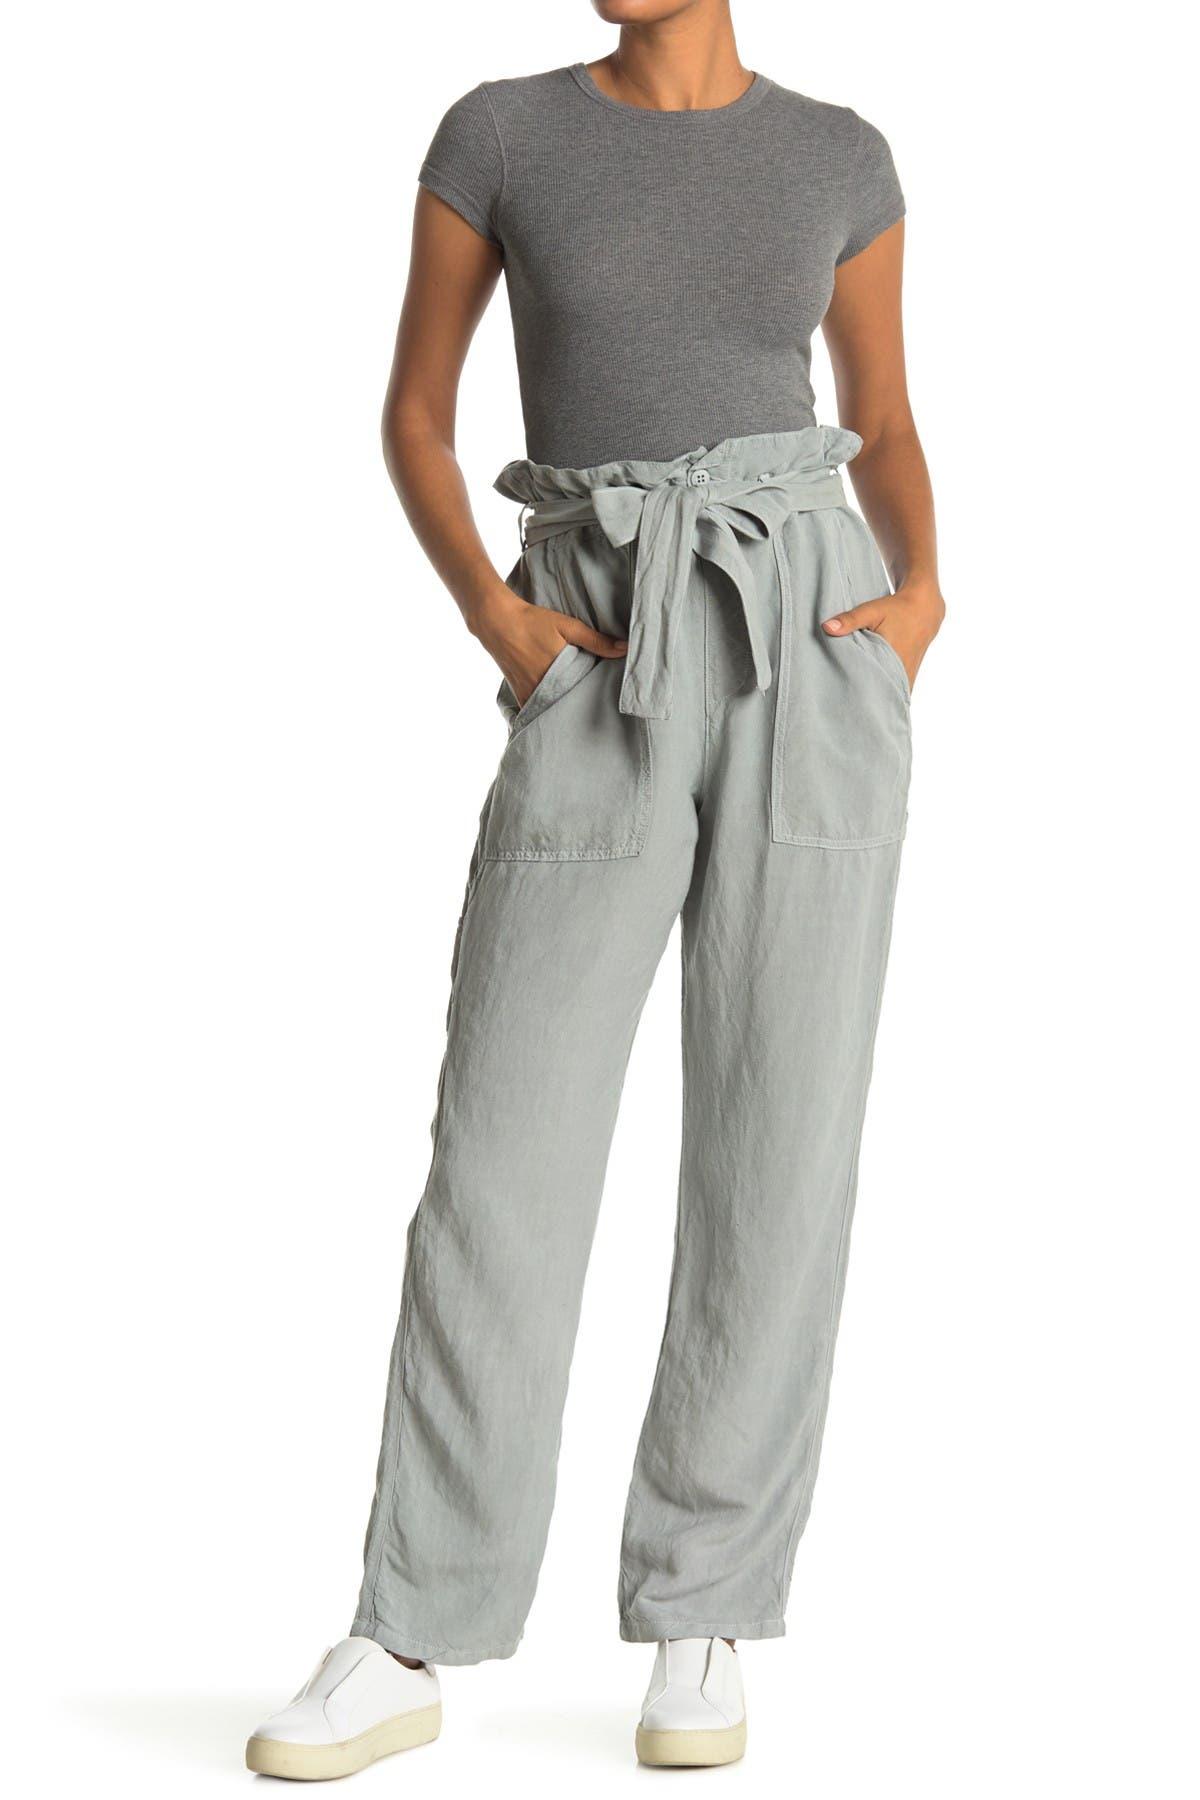 Image of NSF CLOTHING Josephine Paperbag Waist Linen Blend Pants